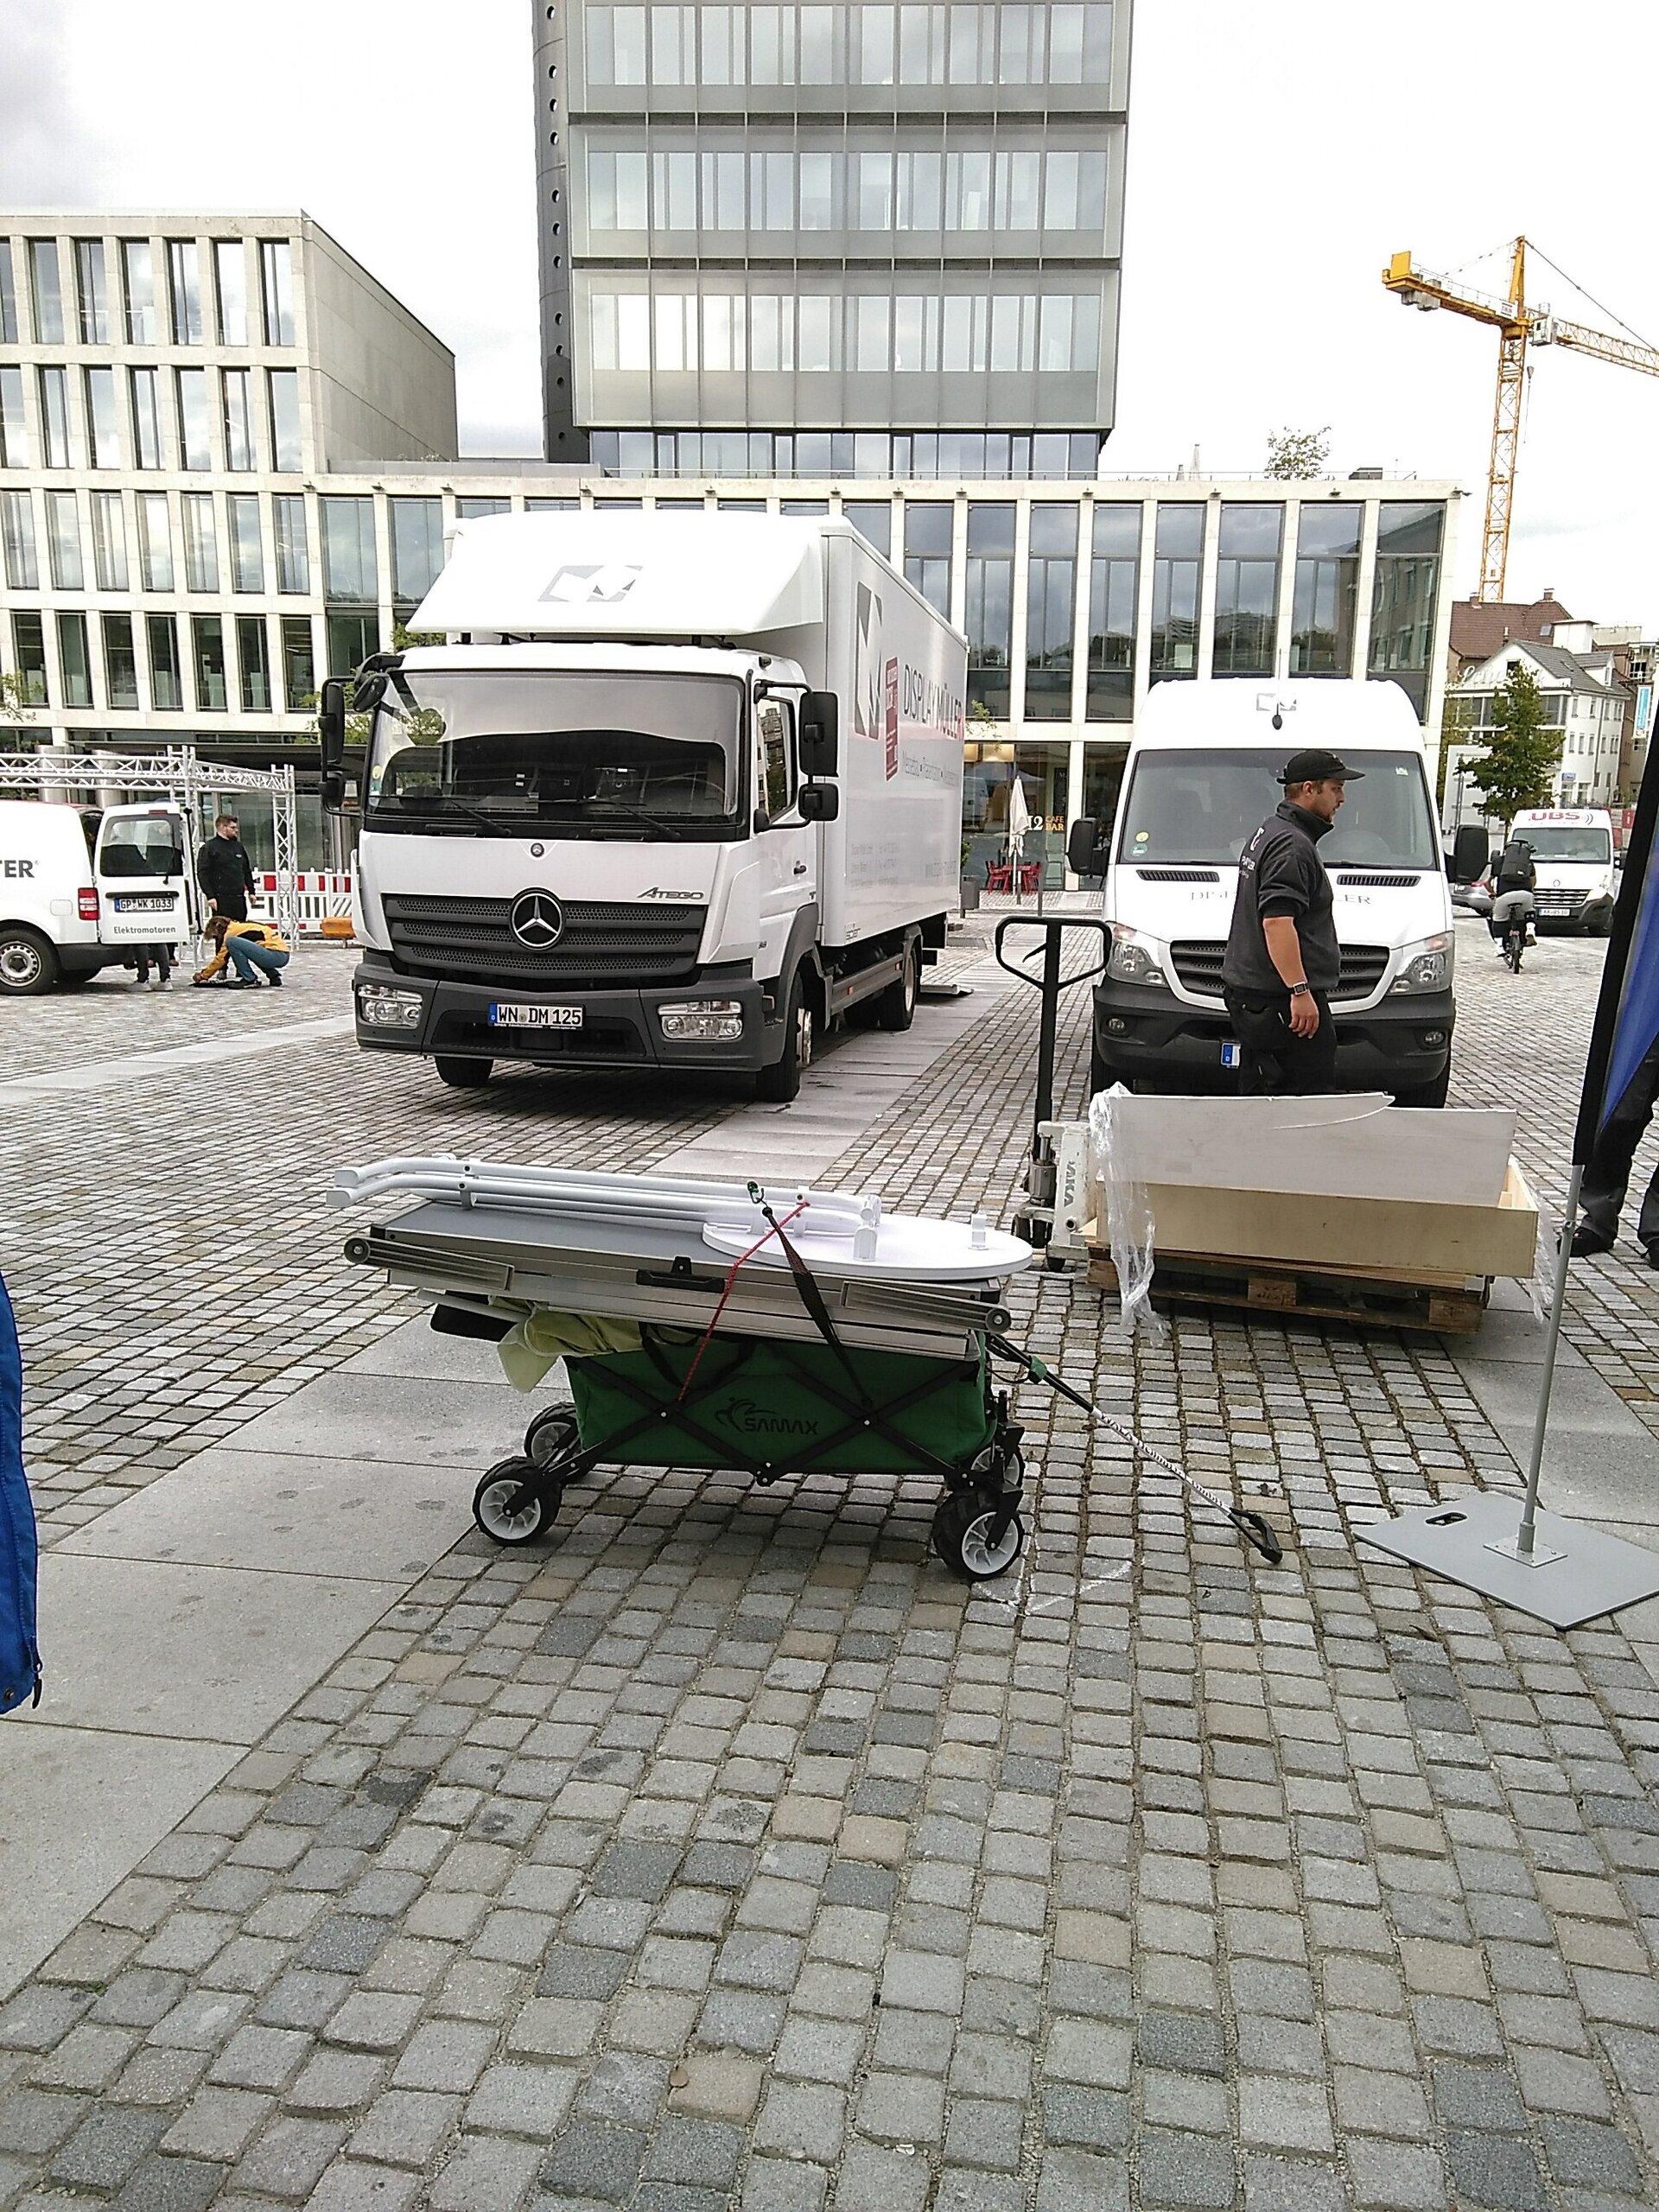 Bollerwagen statt Lastwagen